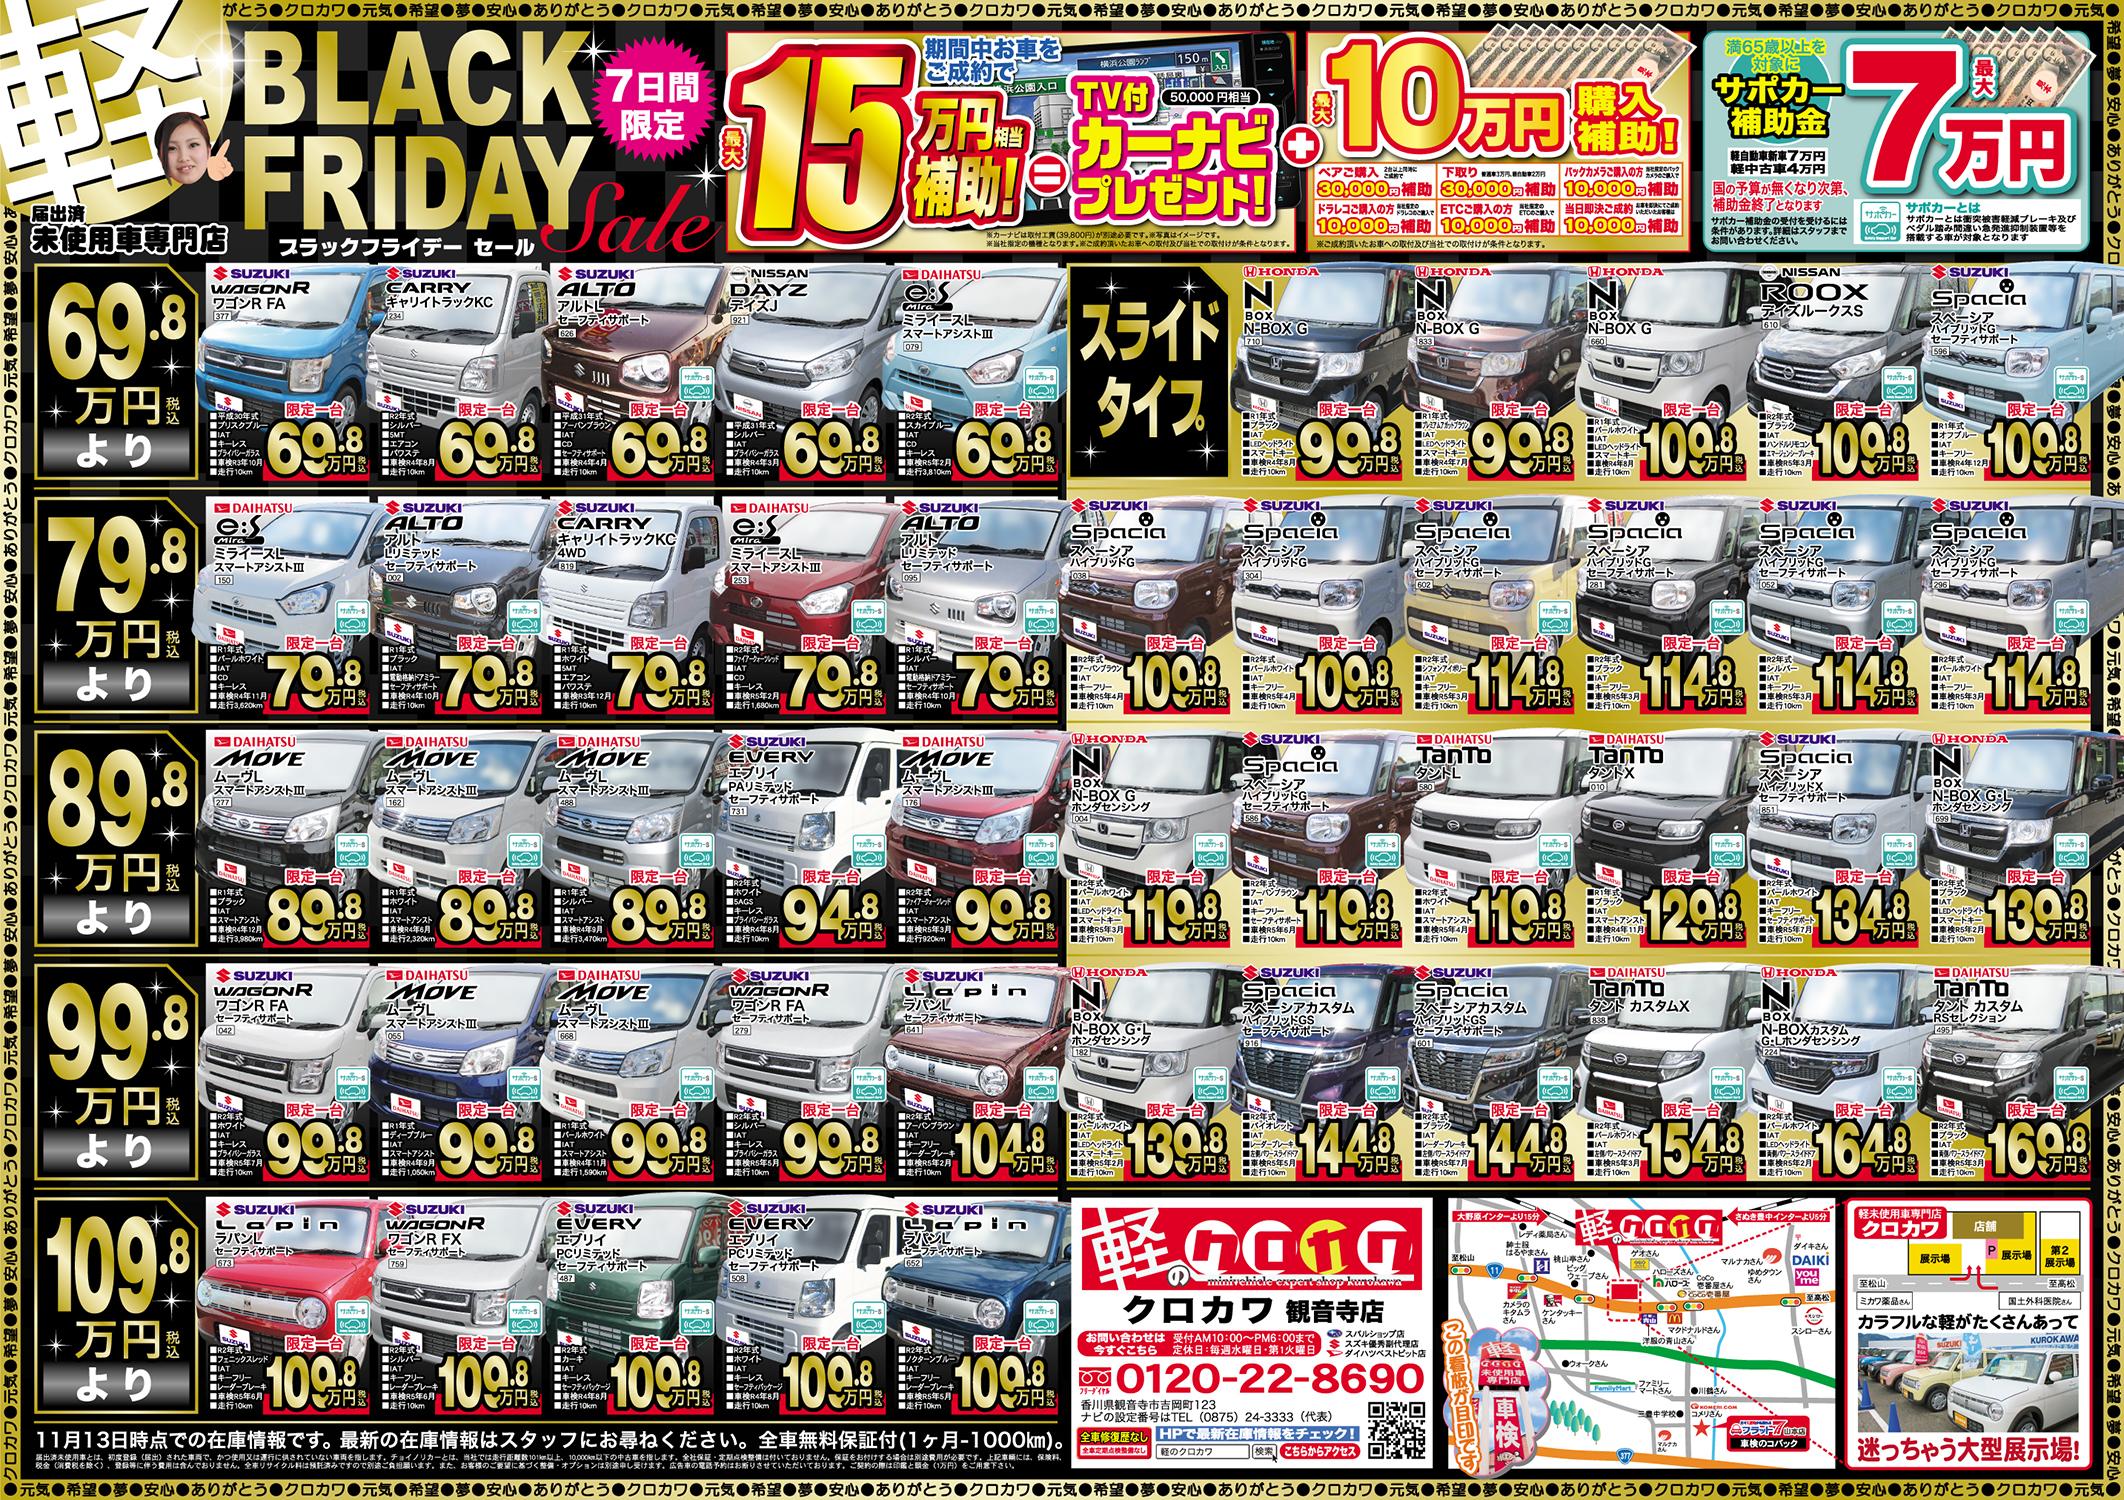 【BLACK FRIDAY SALE】目玉車59.8万円〜